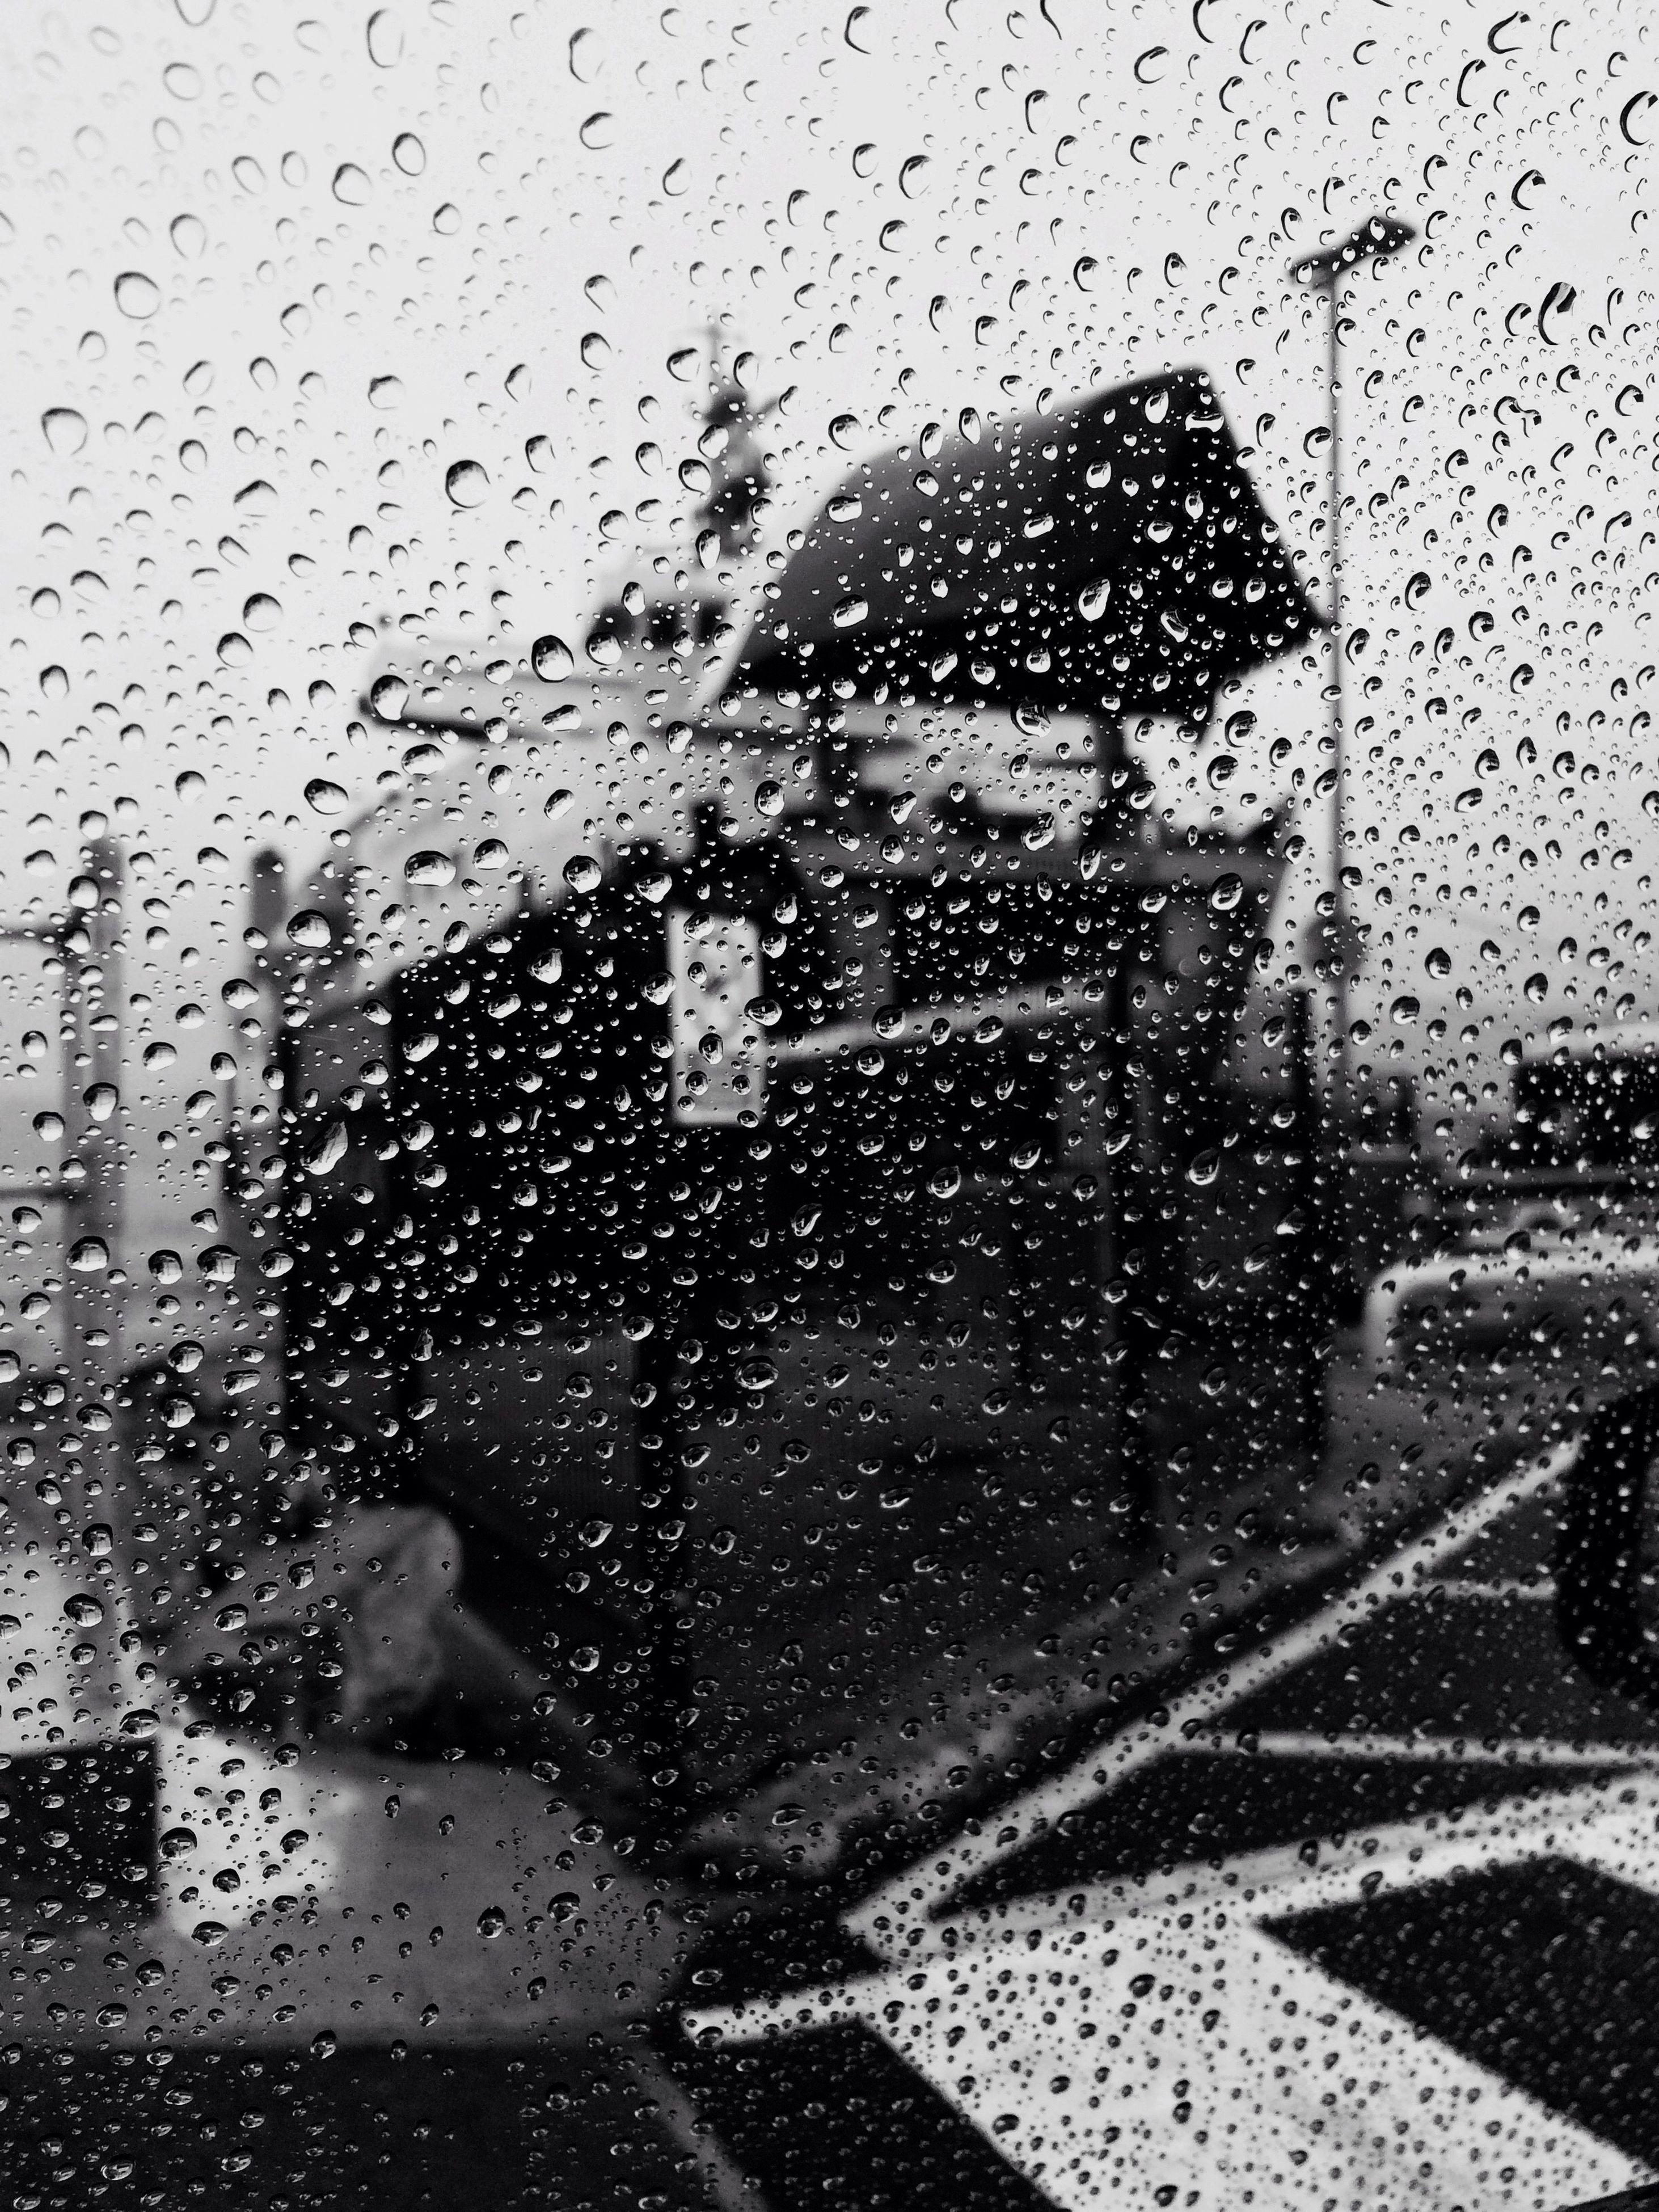 wet, window, water, drop, transparent, rain, glass - material, day, nature, city life